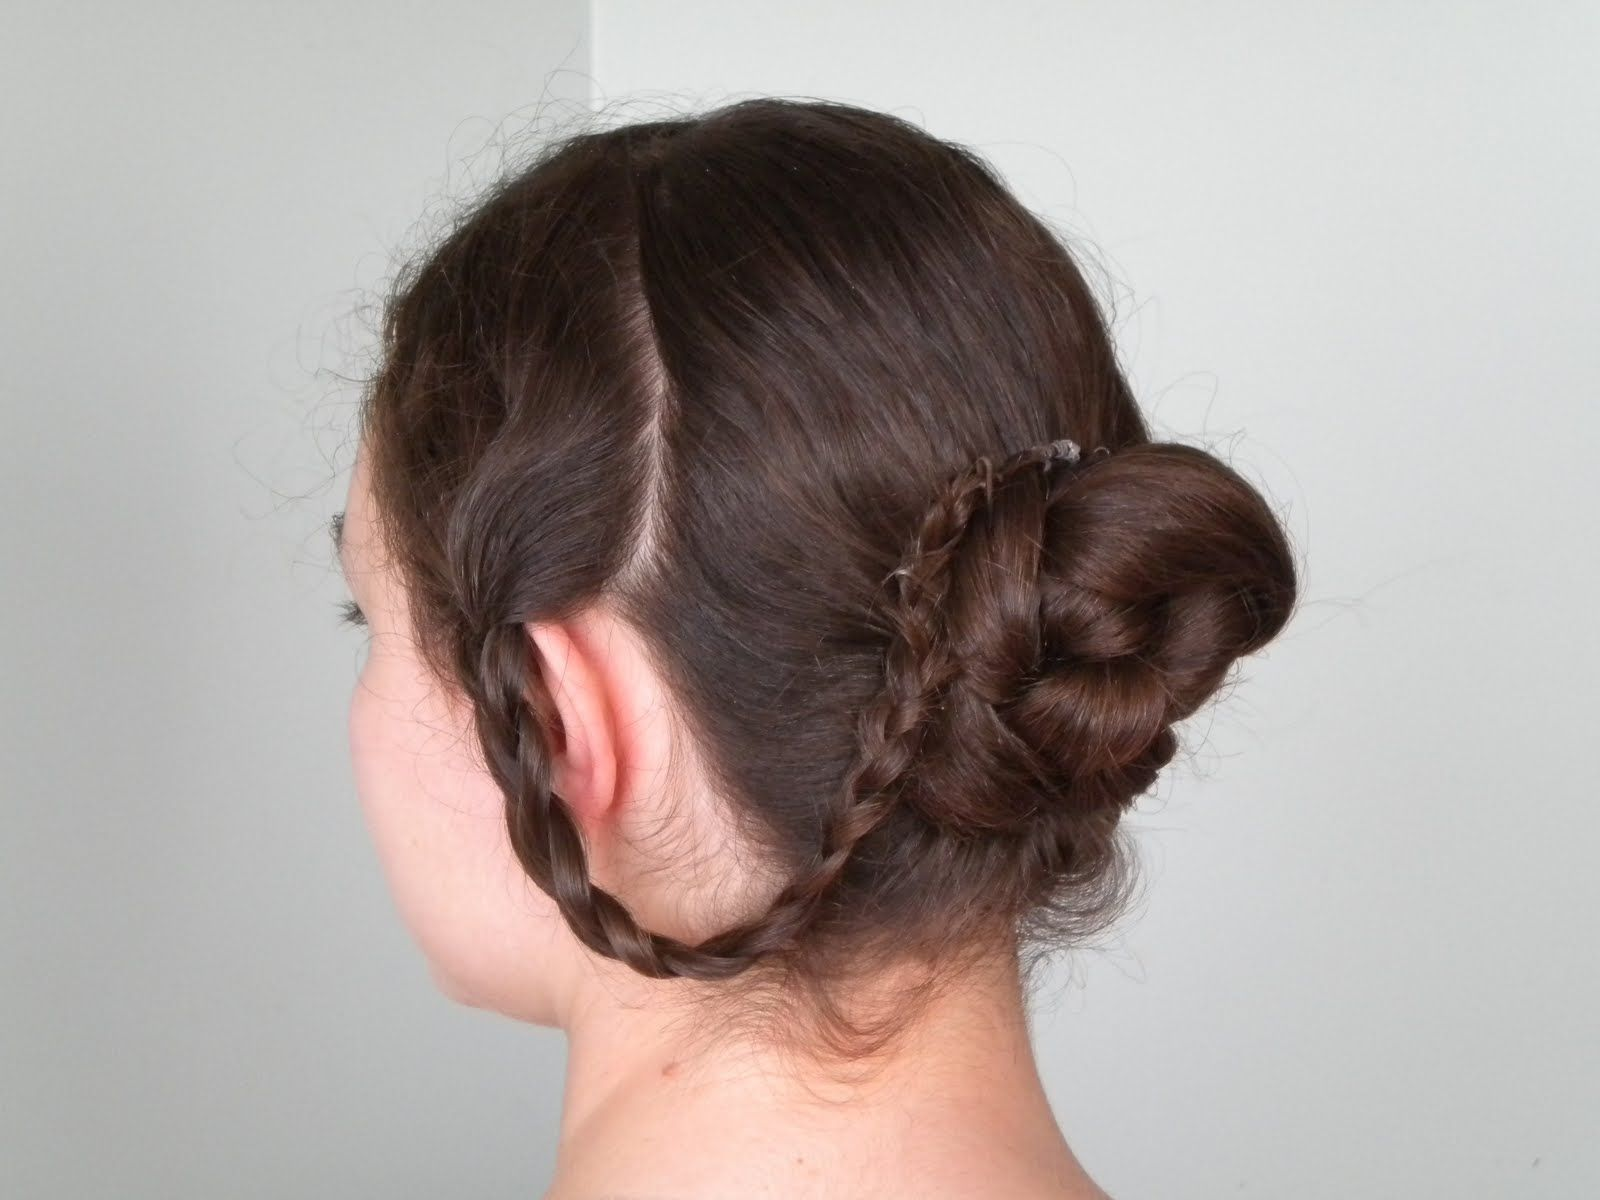 civil war hairstyles women | hair styles | hairstyles